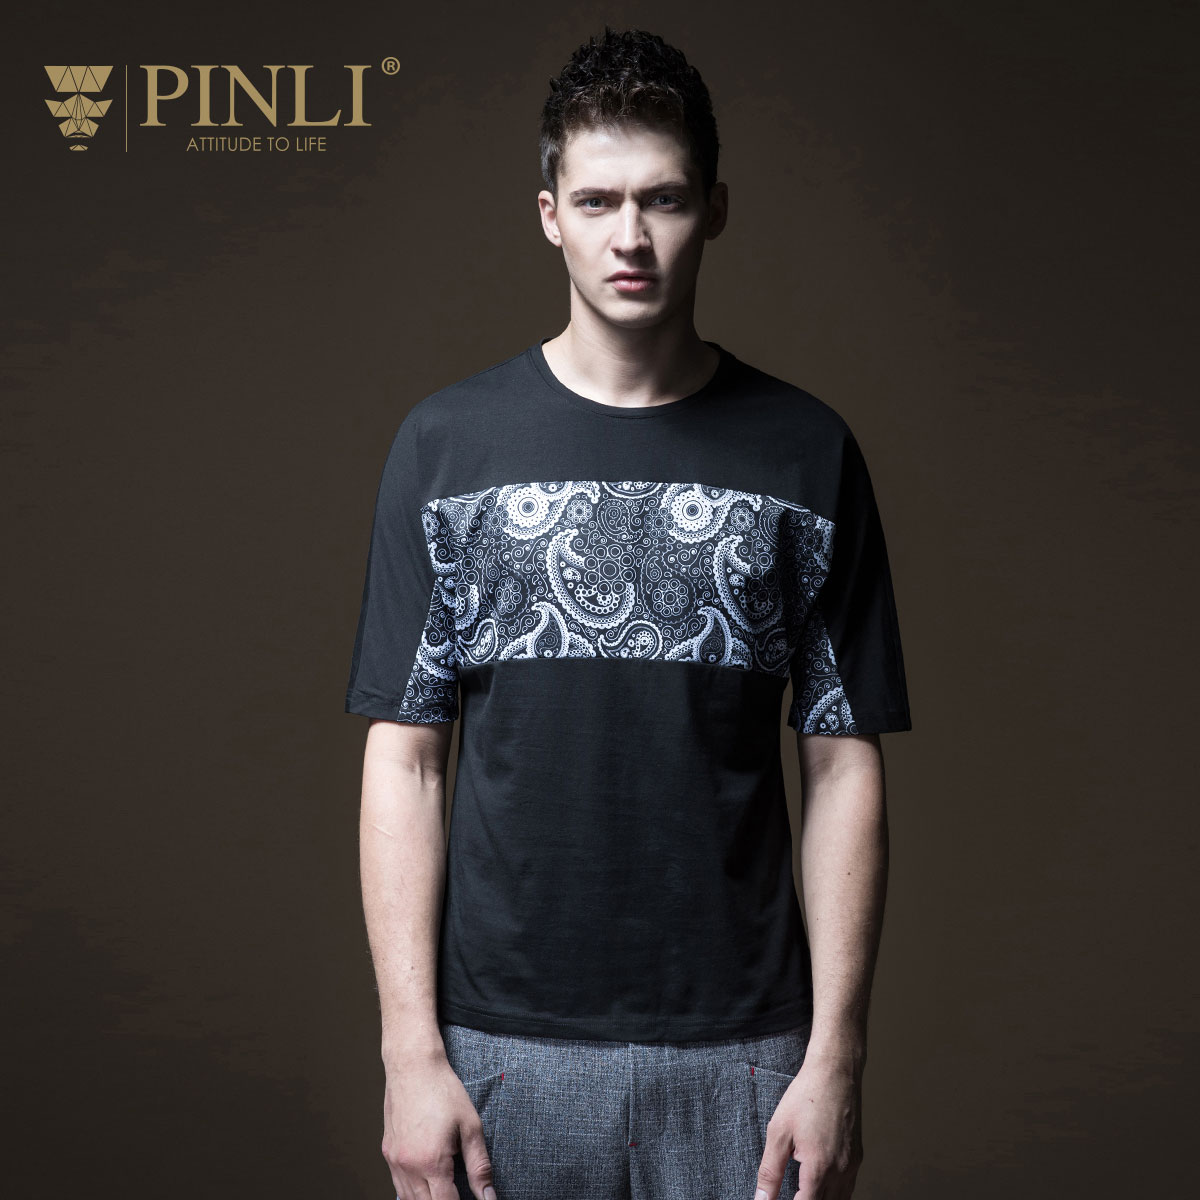 Dragon Ball Rushed Palace Pinli Pin Li 2018 Summer New Men's Dress, Slim Neck, Printed And Short Sleeved T-shirt, B182511352